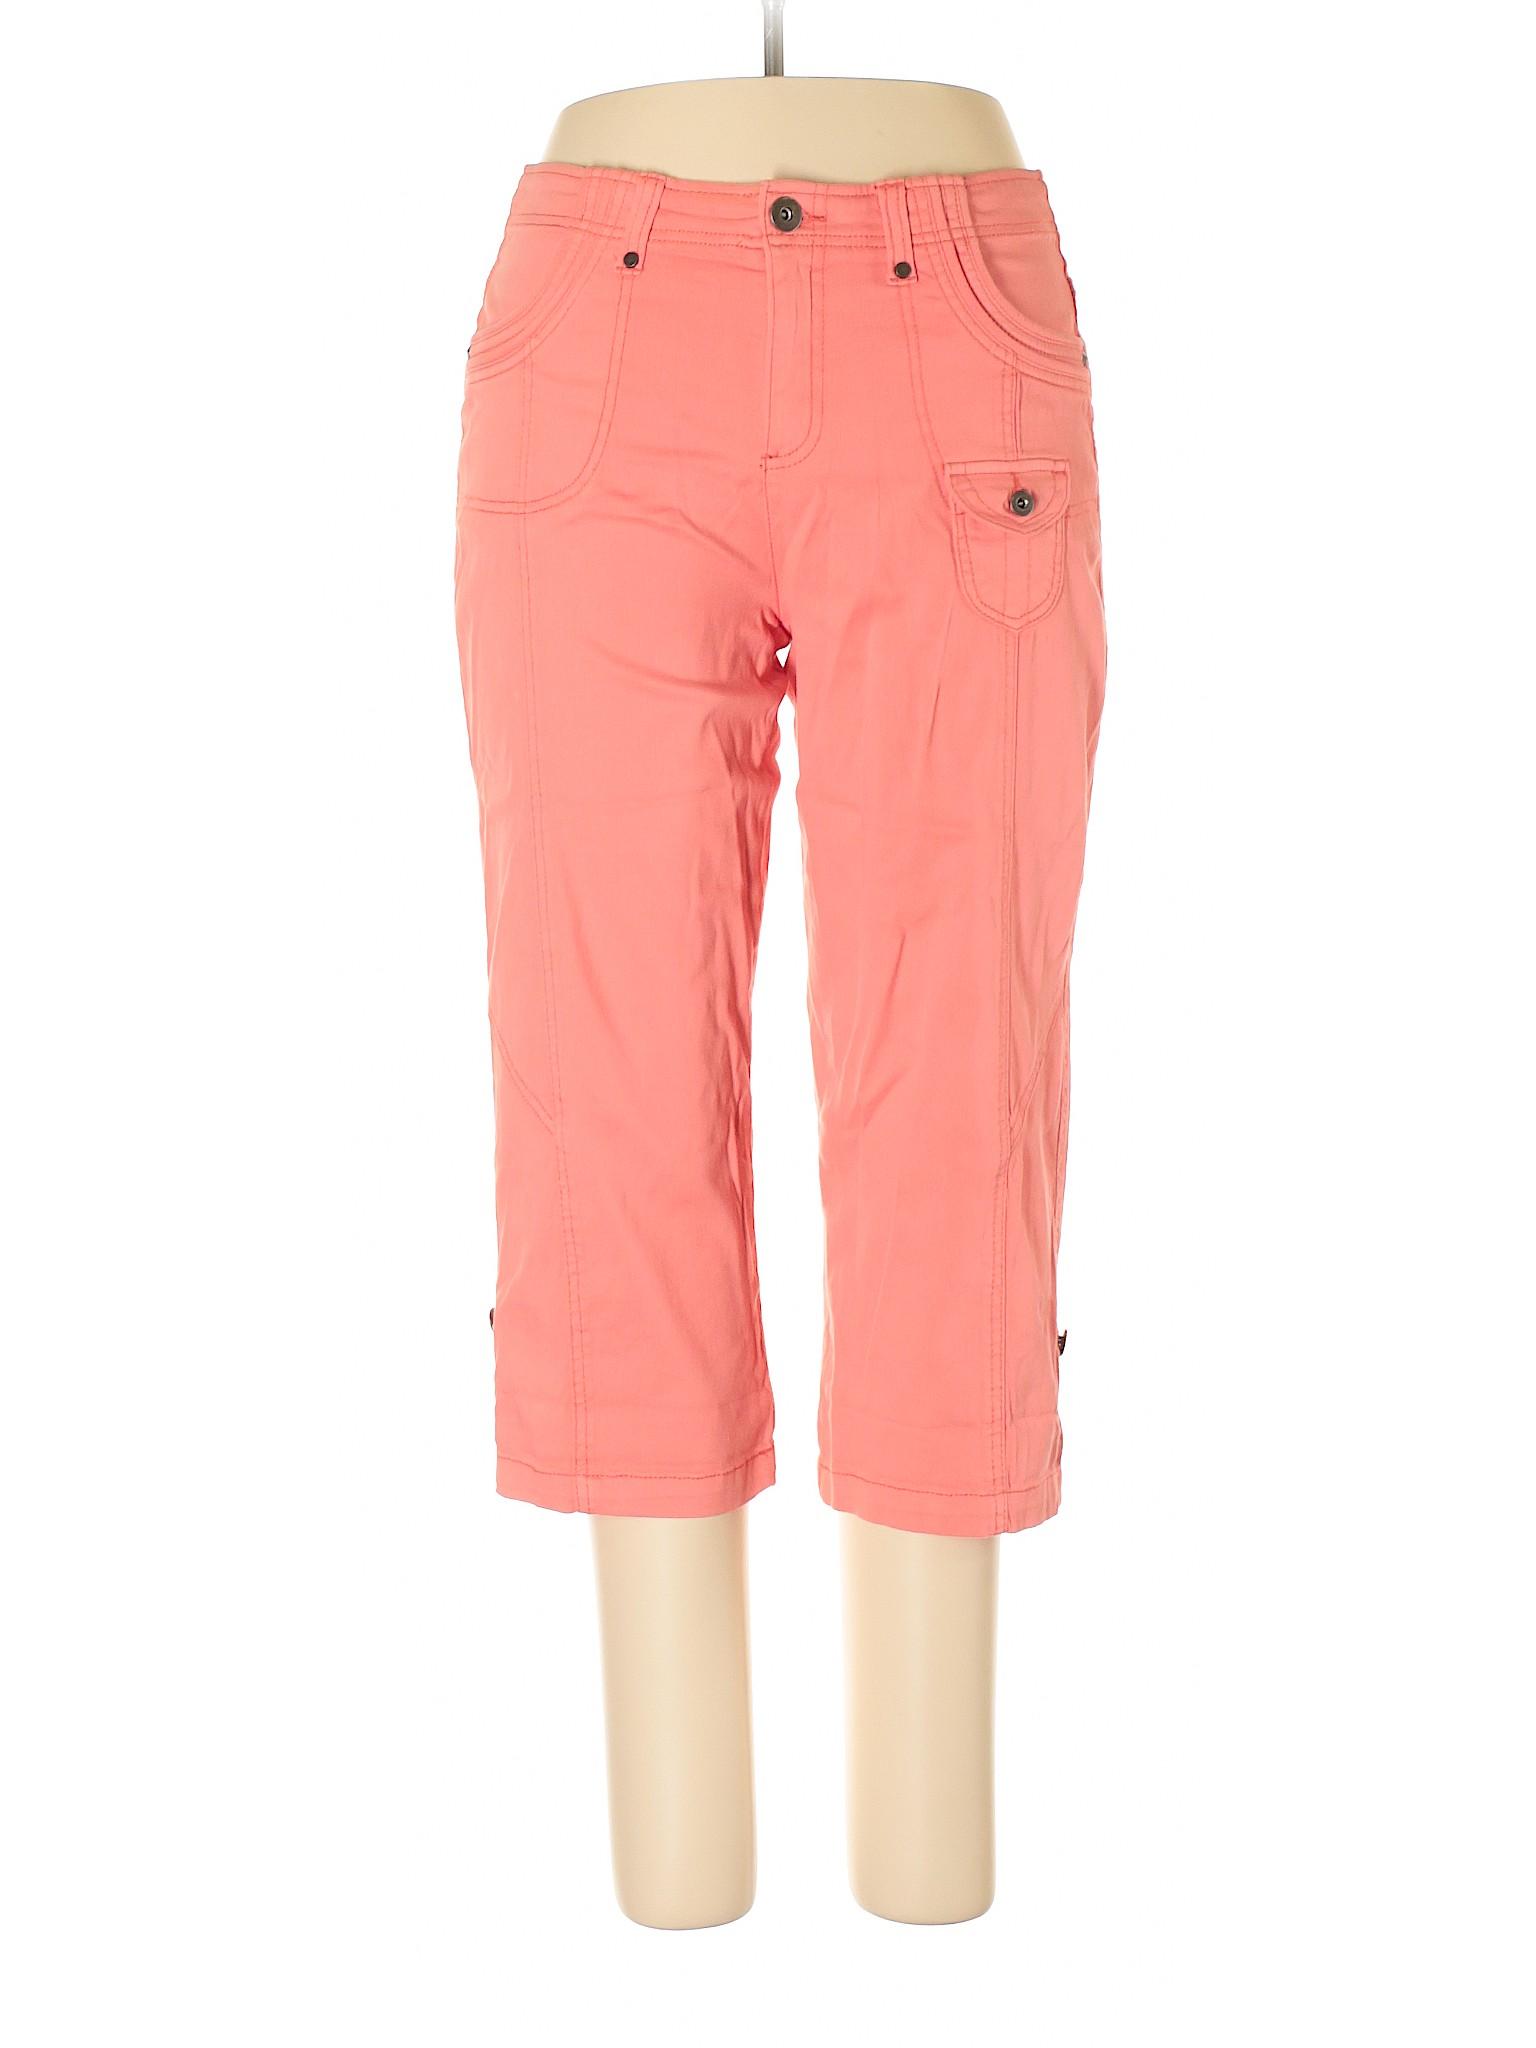 leisure Cargo Boutique Pants amp;Co Style pd6wnnzqH